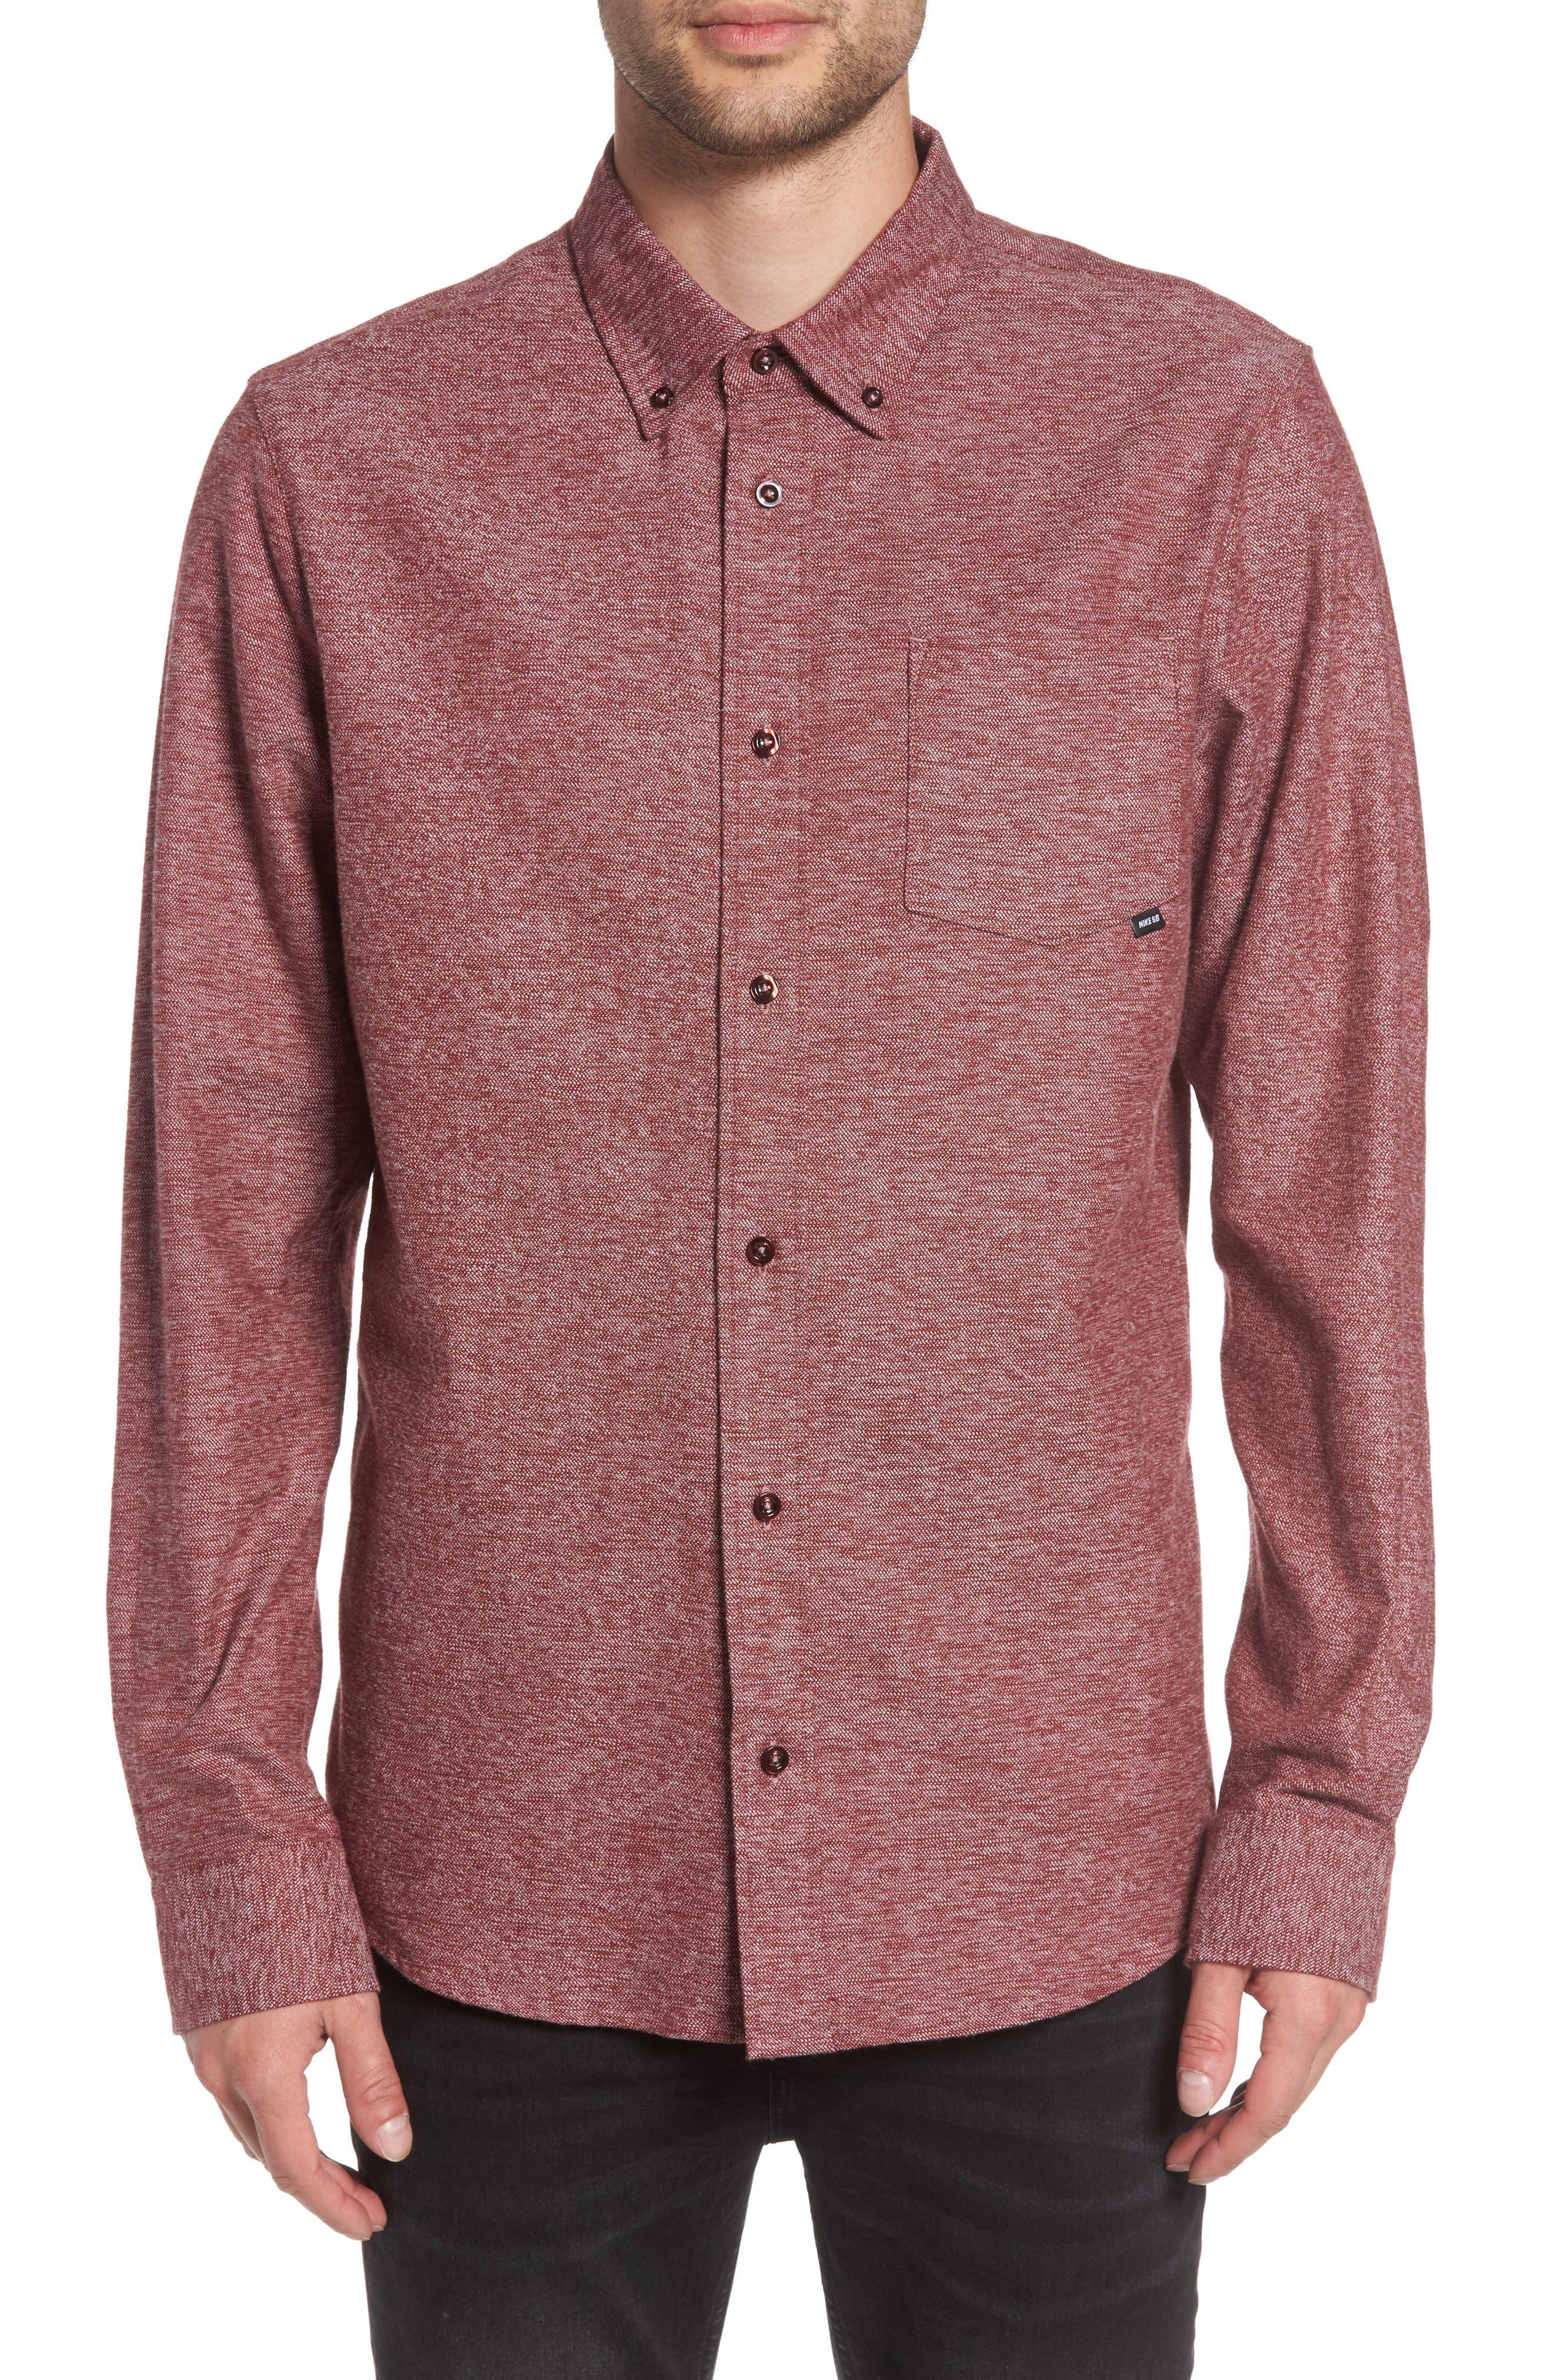 Holgate Flex Shirt,                         Main,                         color, Dark Team Red